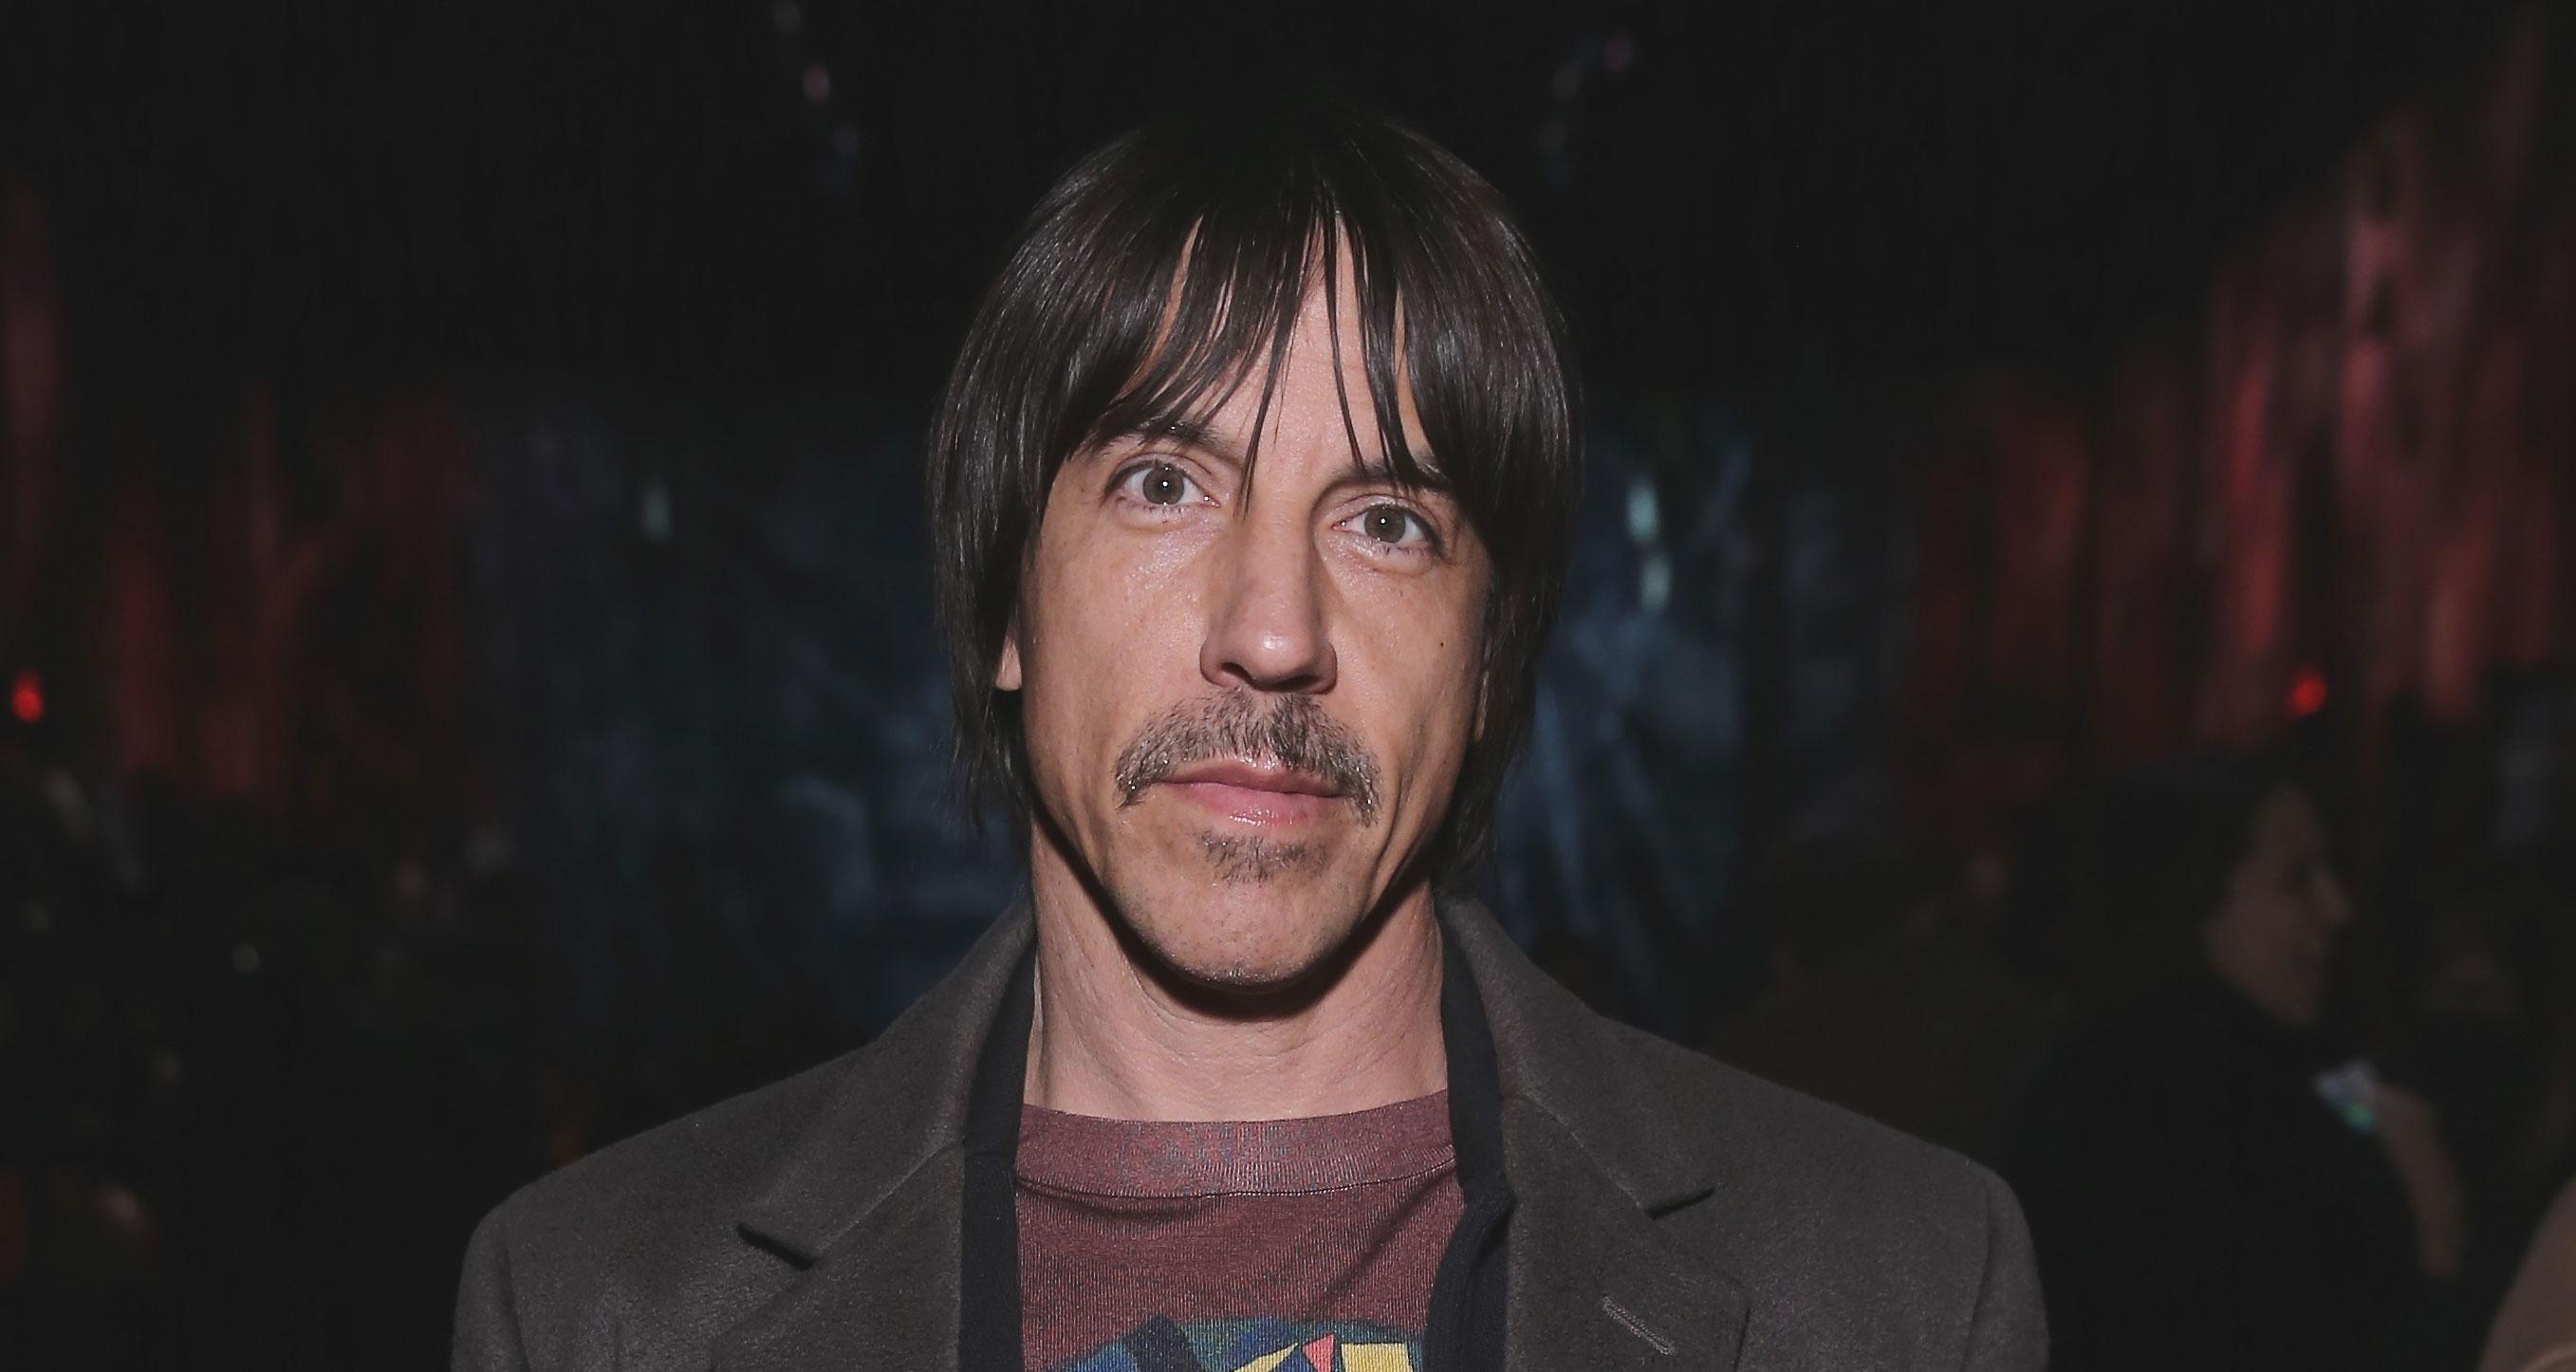 Red Hot Chili Peppers Singer Anthony Kiedis Hospitalized ...